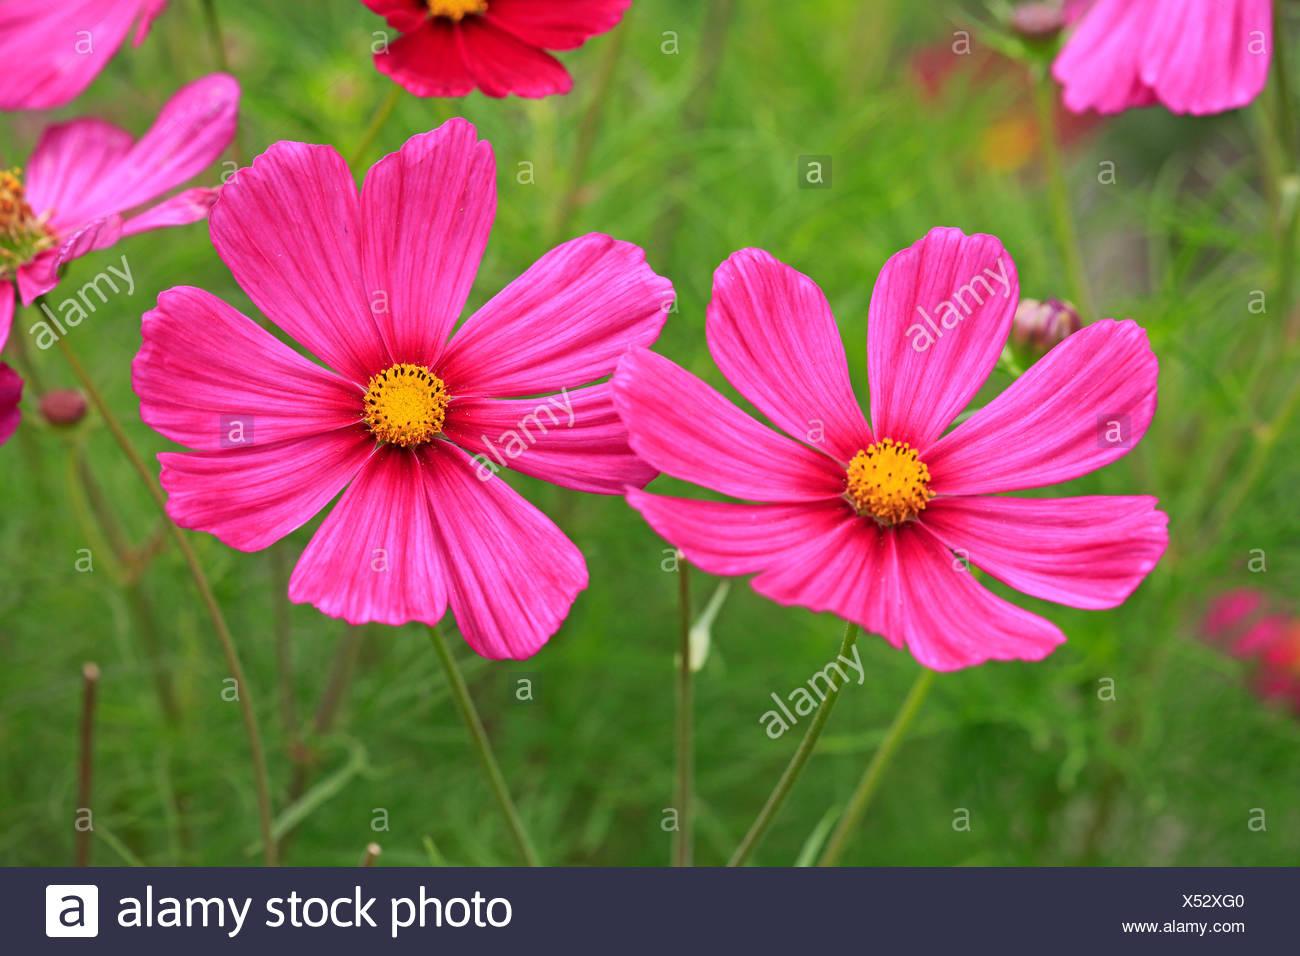 Garden Cosmos / (Cosmos bipinnatus) - Stock Image